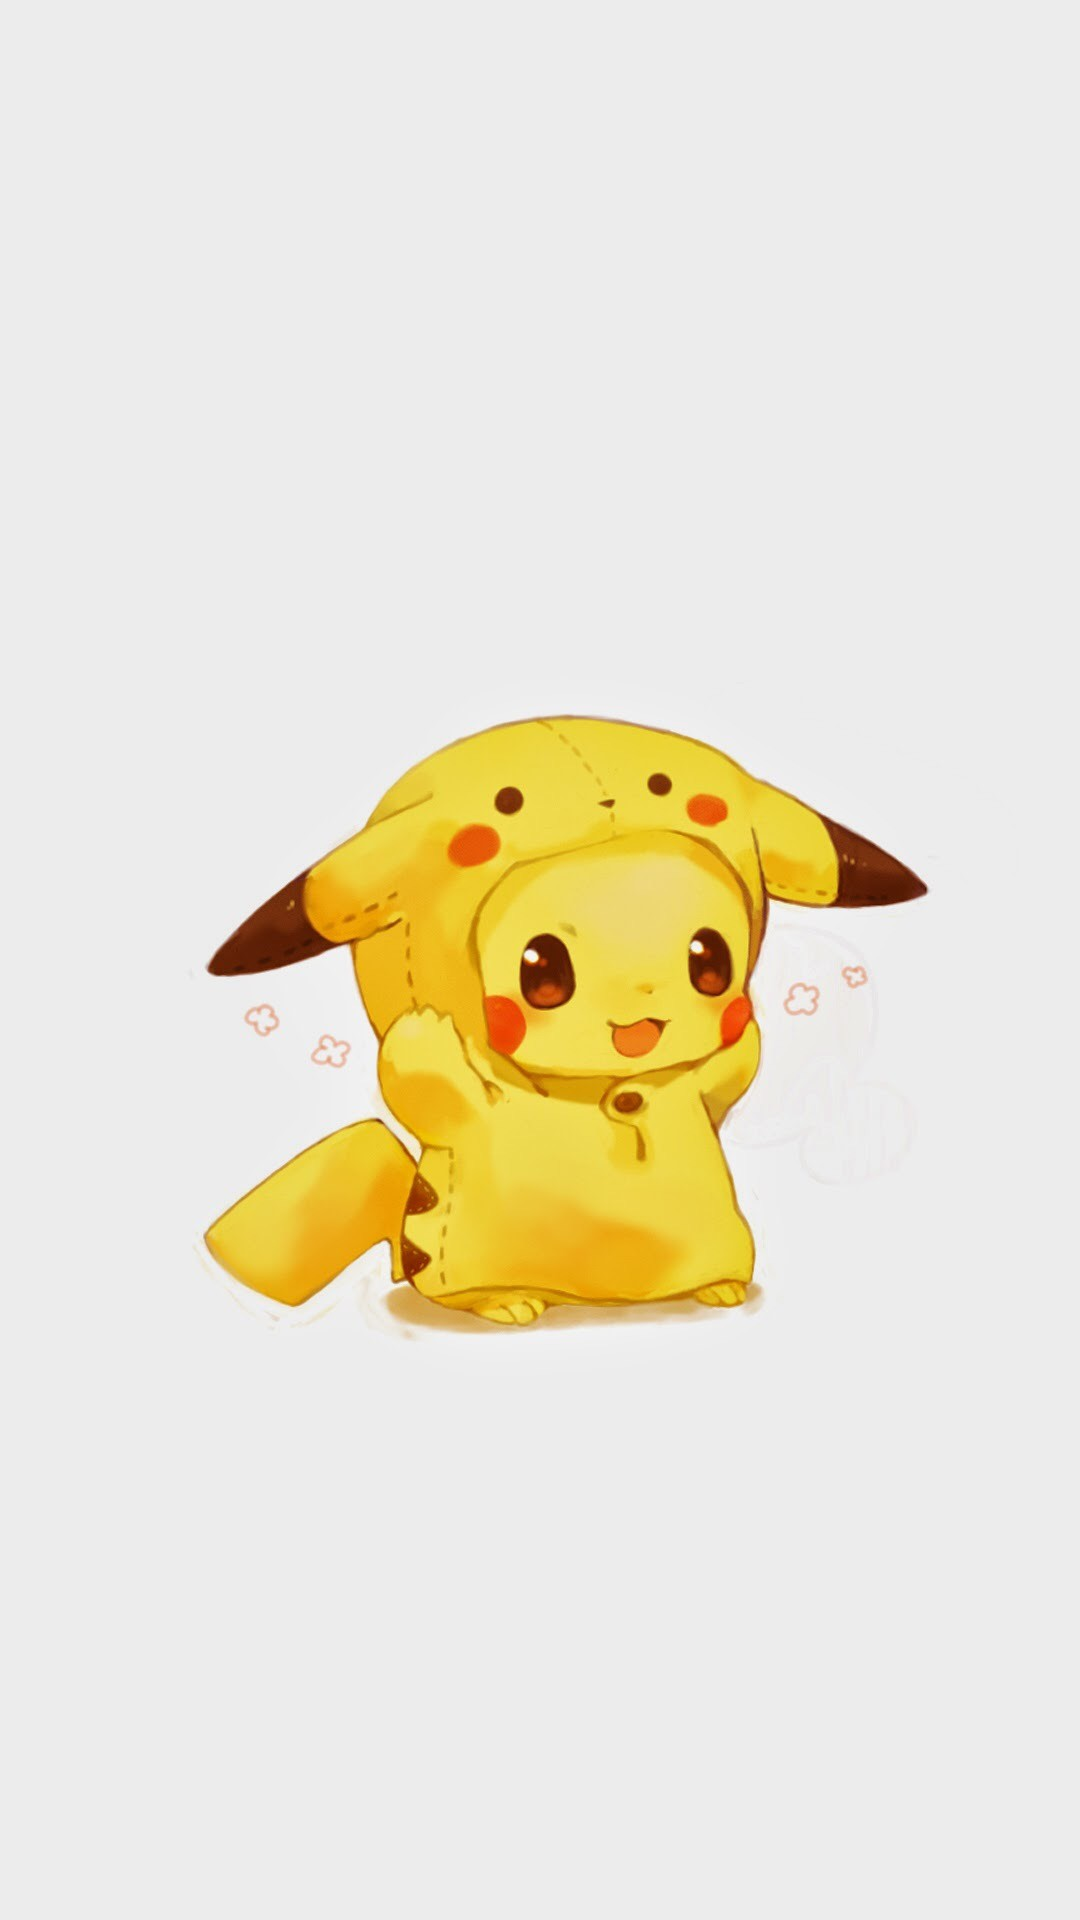 pokemon phone wallpaper hd 81 images